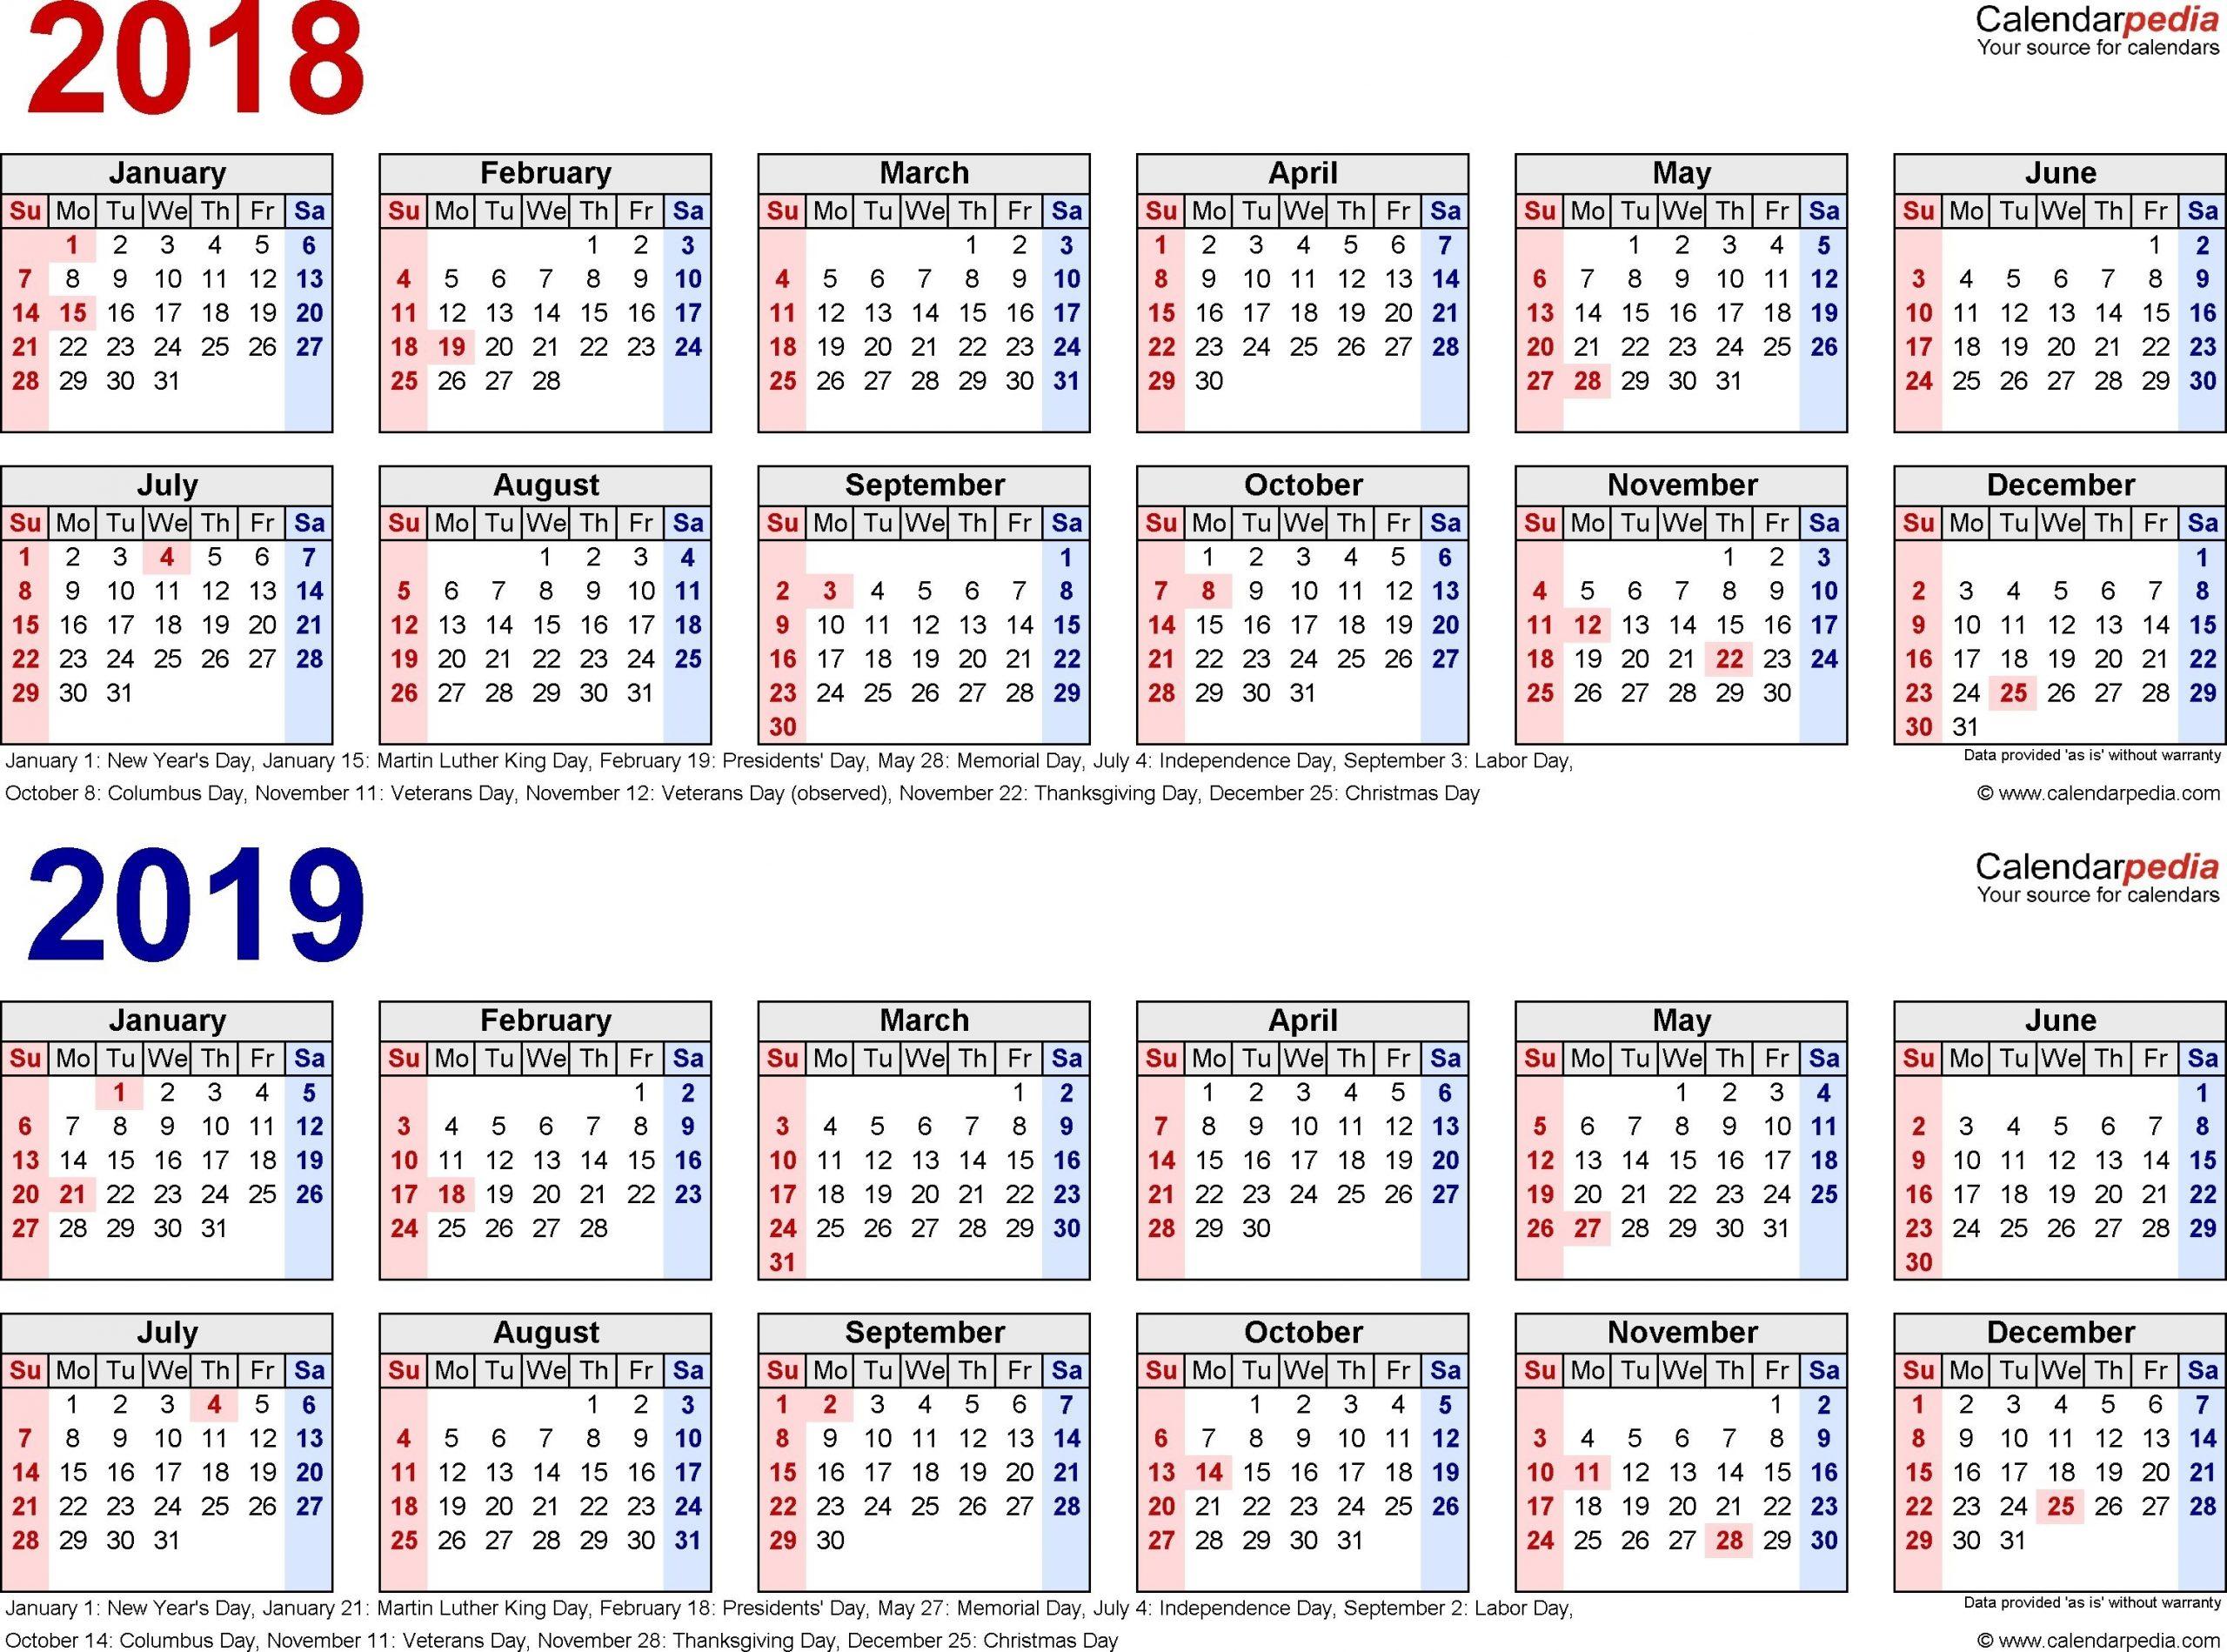 2018-2019 Calendar - Free Printable Two-Year Pdf Calendars